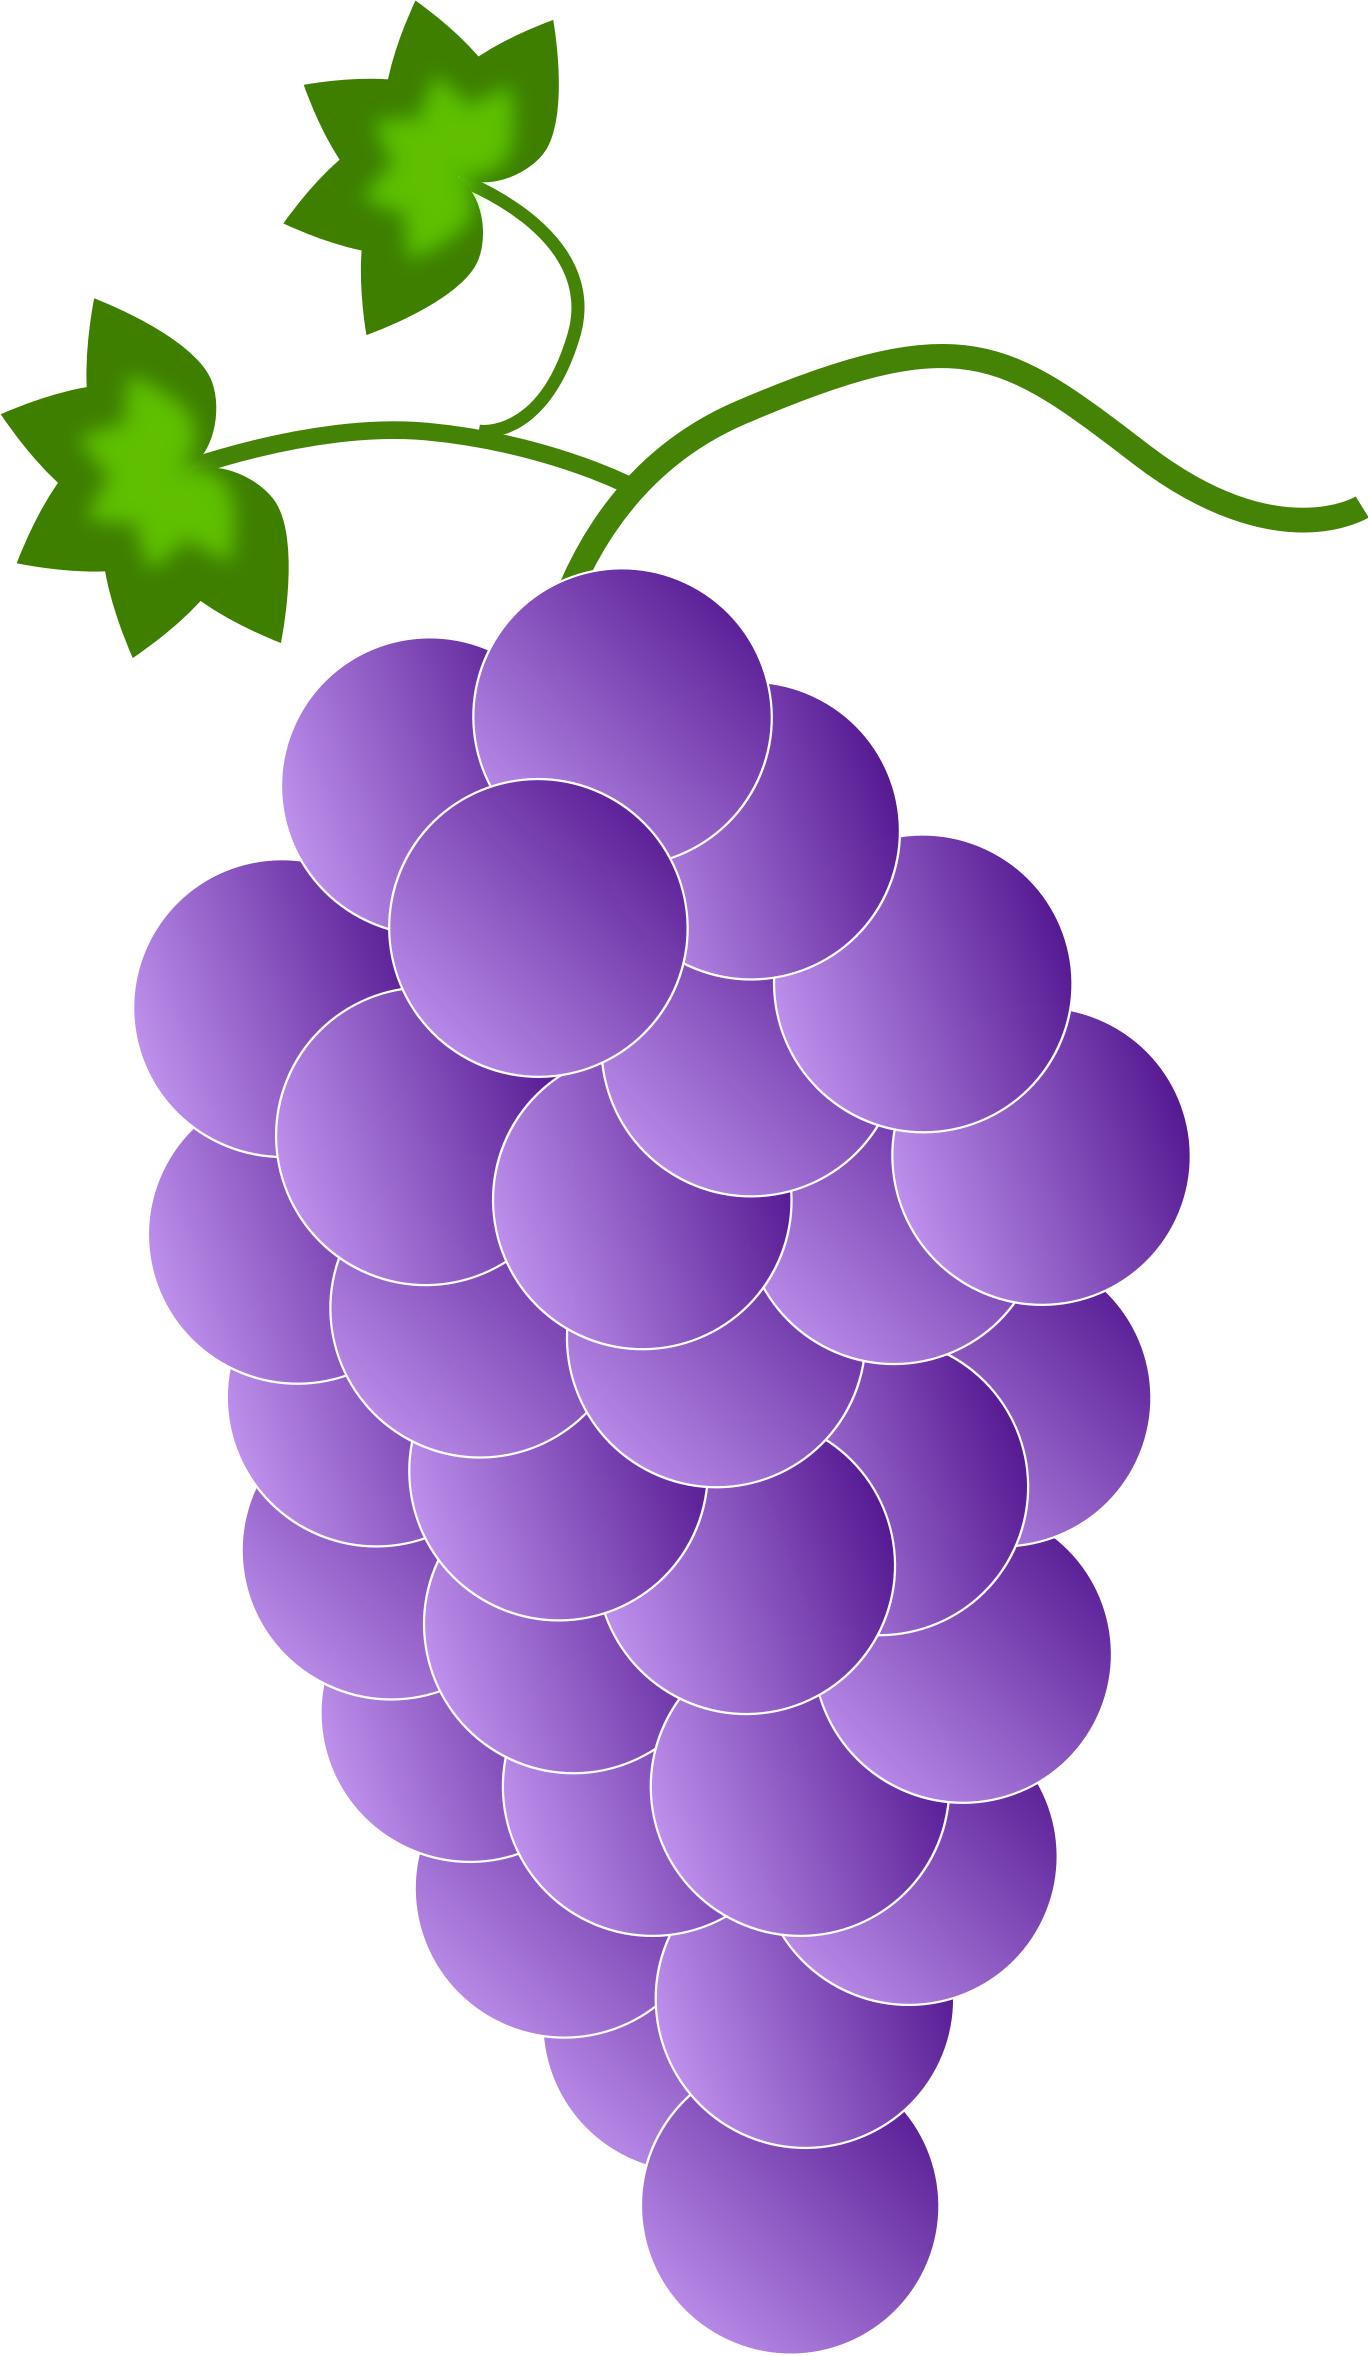 Grape clipart vine clip art. Common color purple grapes